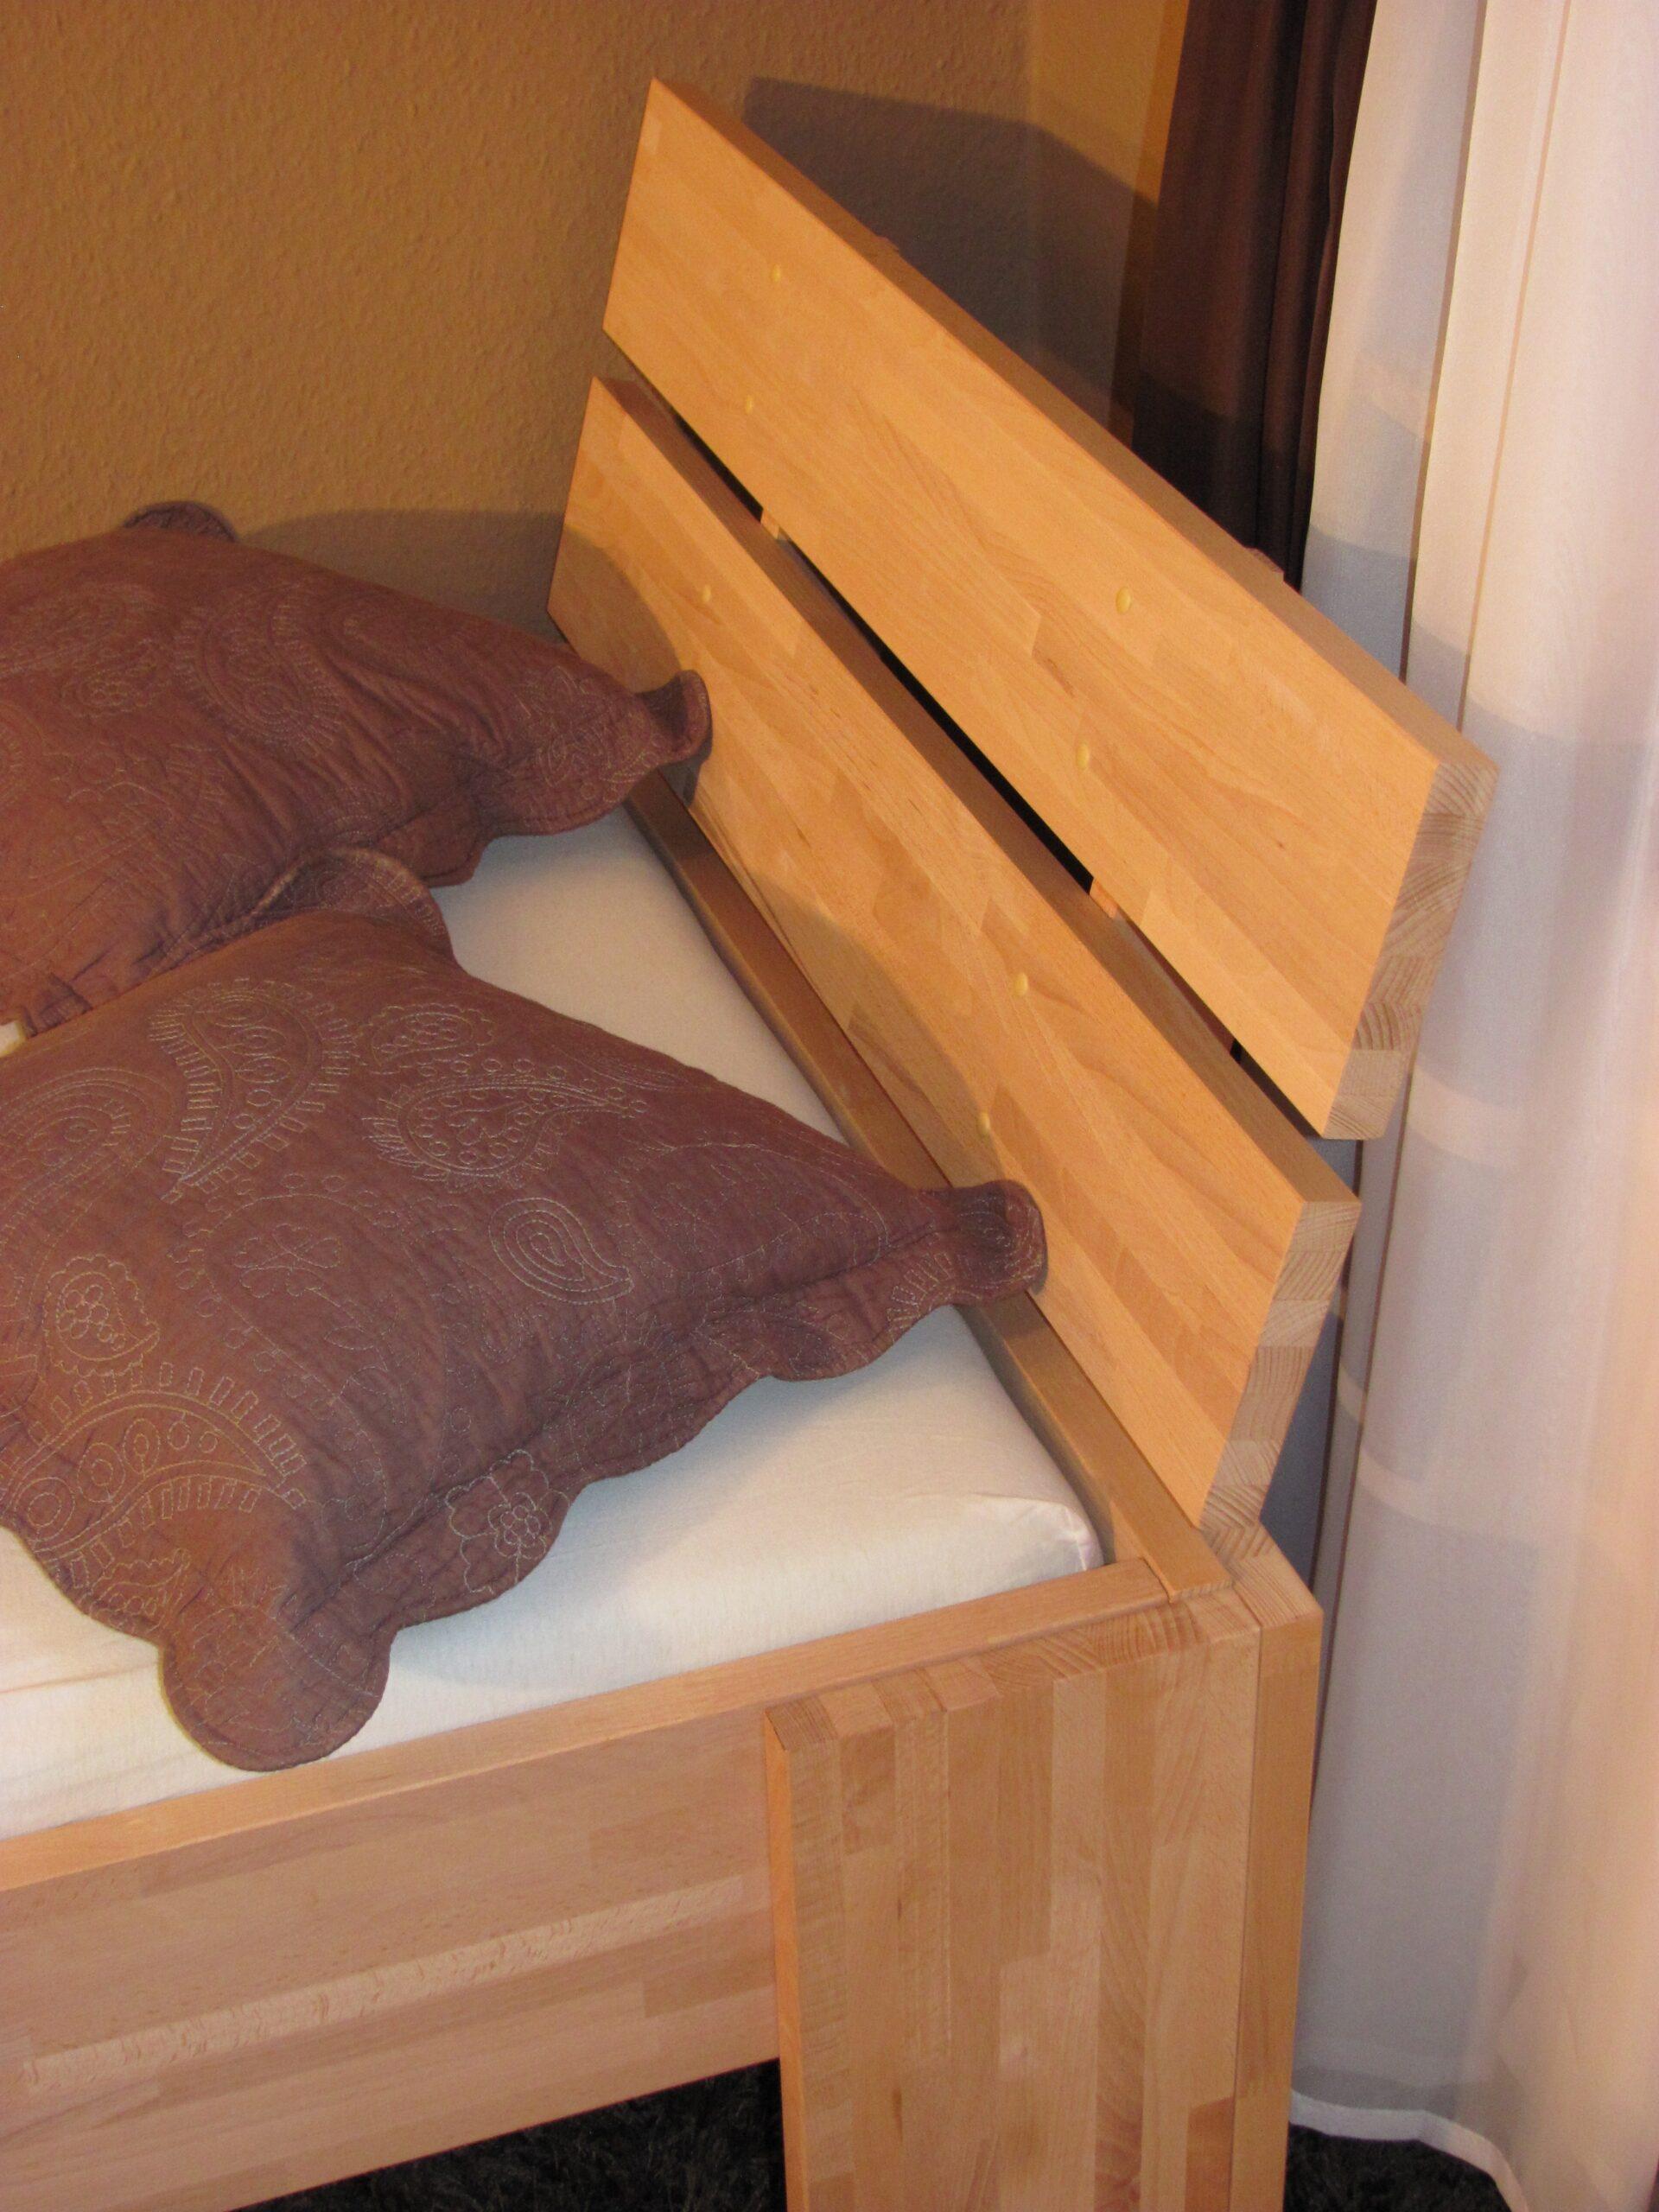 Full Size of Bett 1 20 Breit 27mm Massivholzbett Einzelbett Doppelbett Mit Fuss I 140 200x180 160x200 Lattenrost Und Matratze 140x200 Poco Chesterfield 180x200 Komplett Wohnzimmer Bett 1 20 Breit